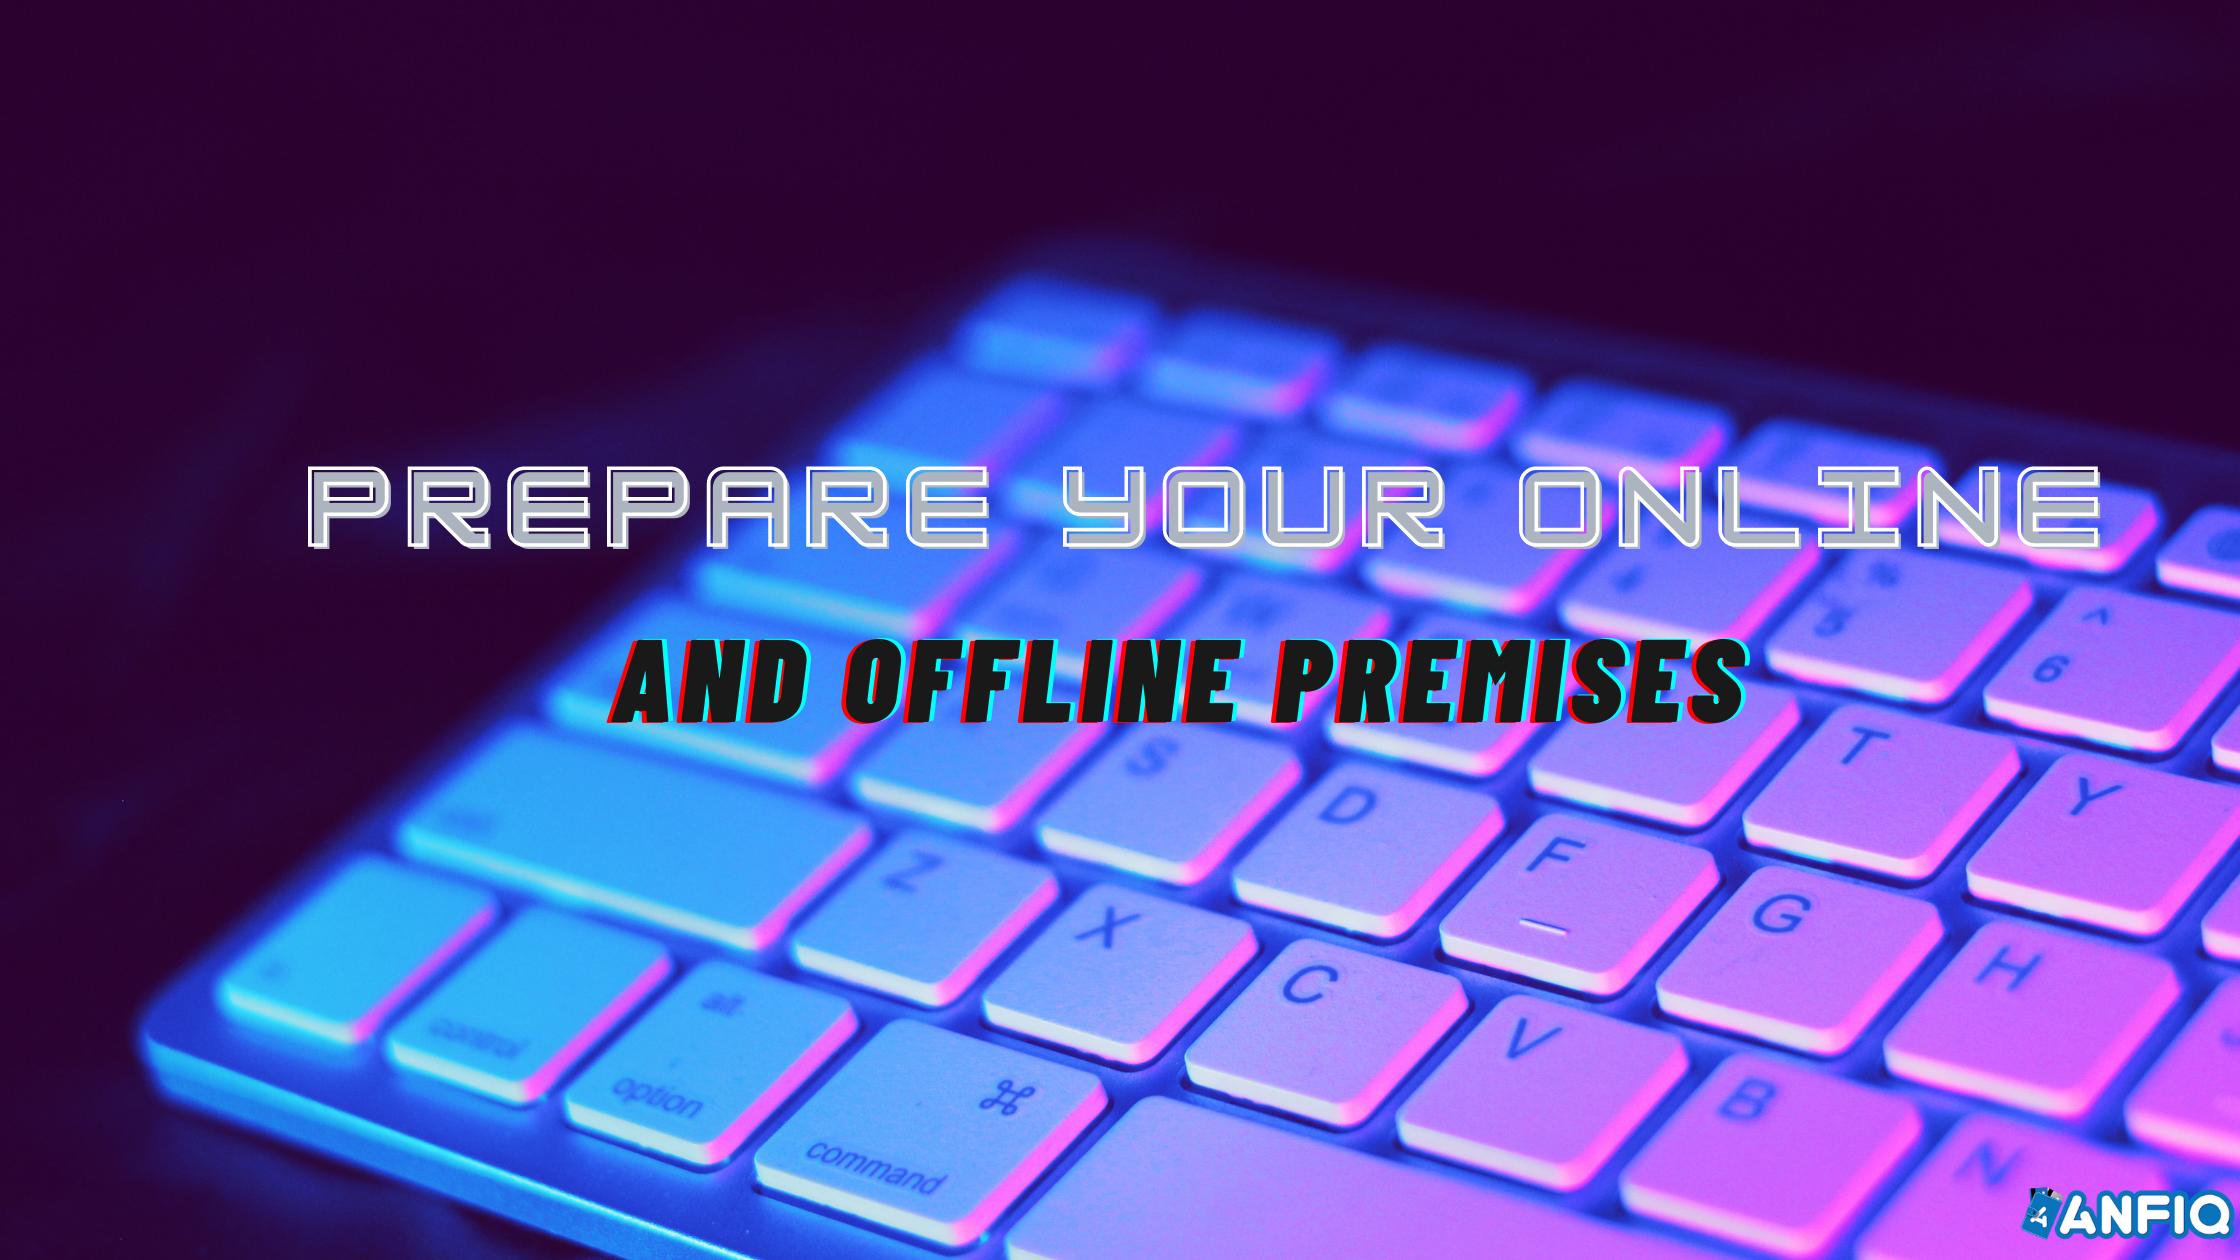 Prepare your Online and Offline Premises